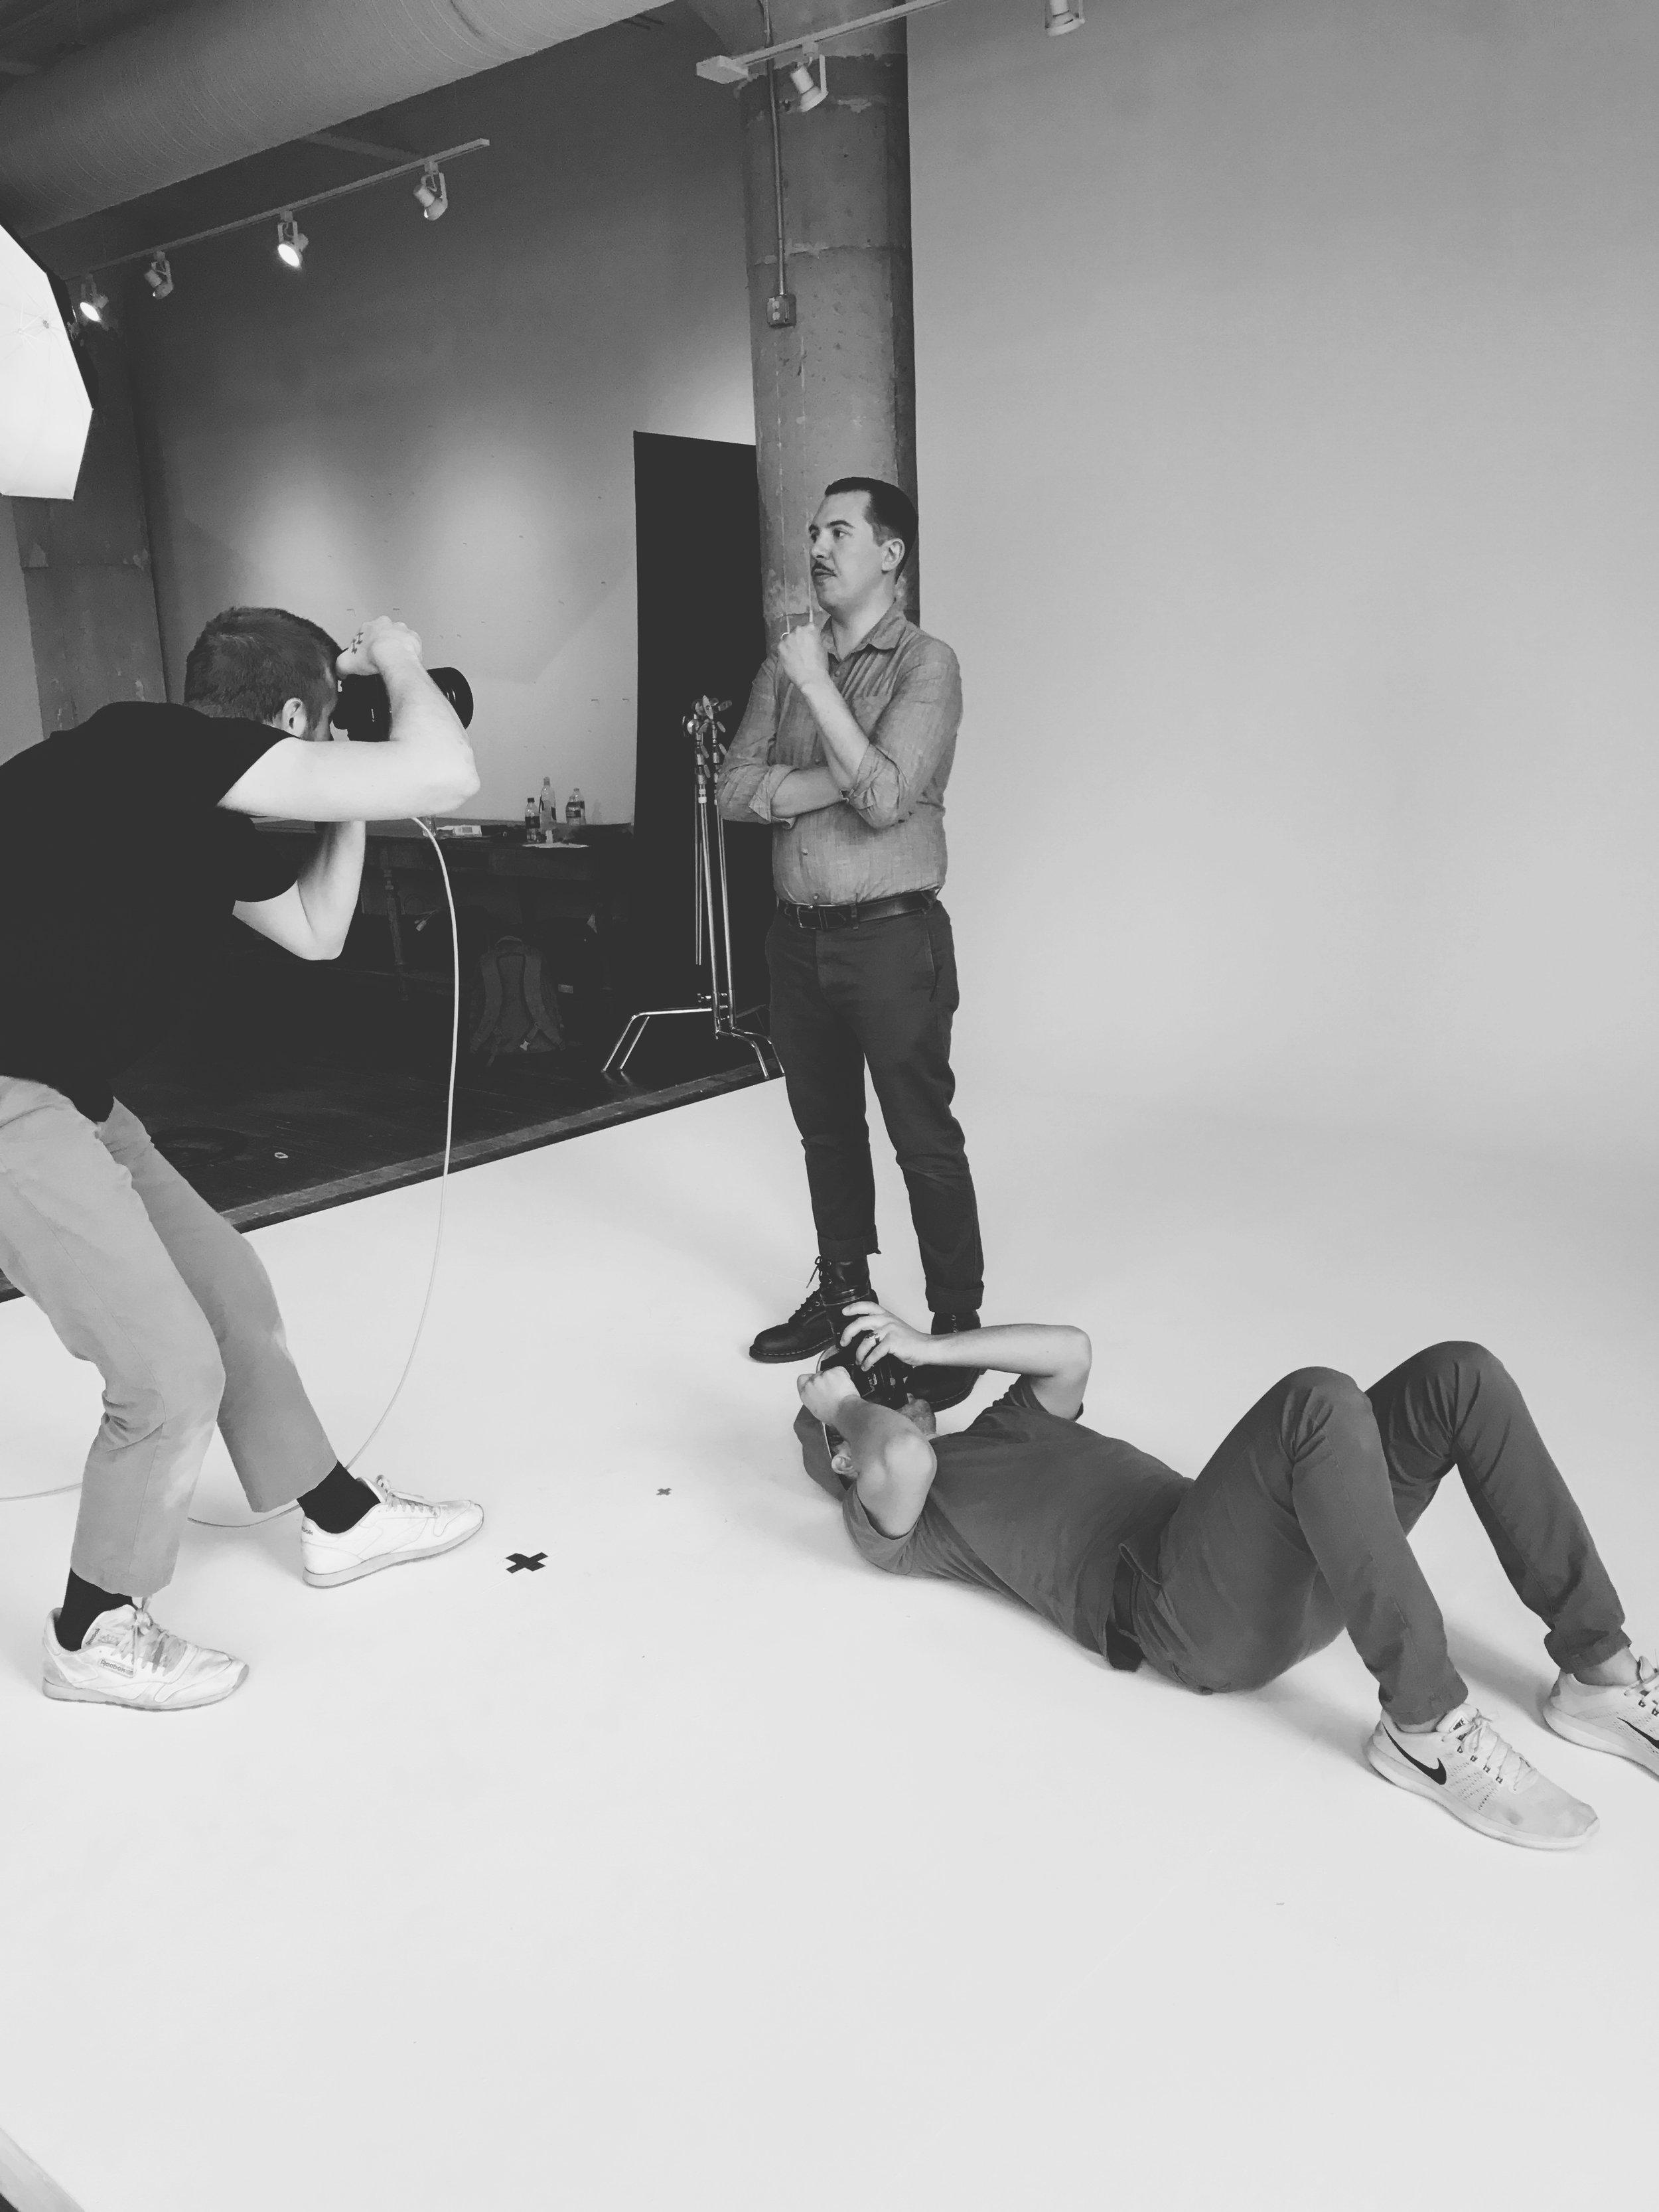 Photographer Erik Tanner shooting James Beard nominee mixologist Miles McQuarrie (Kimball House) as filmmaker Ben Brinker gets his shot, as well.